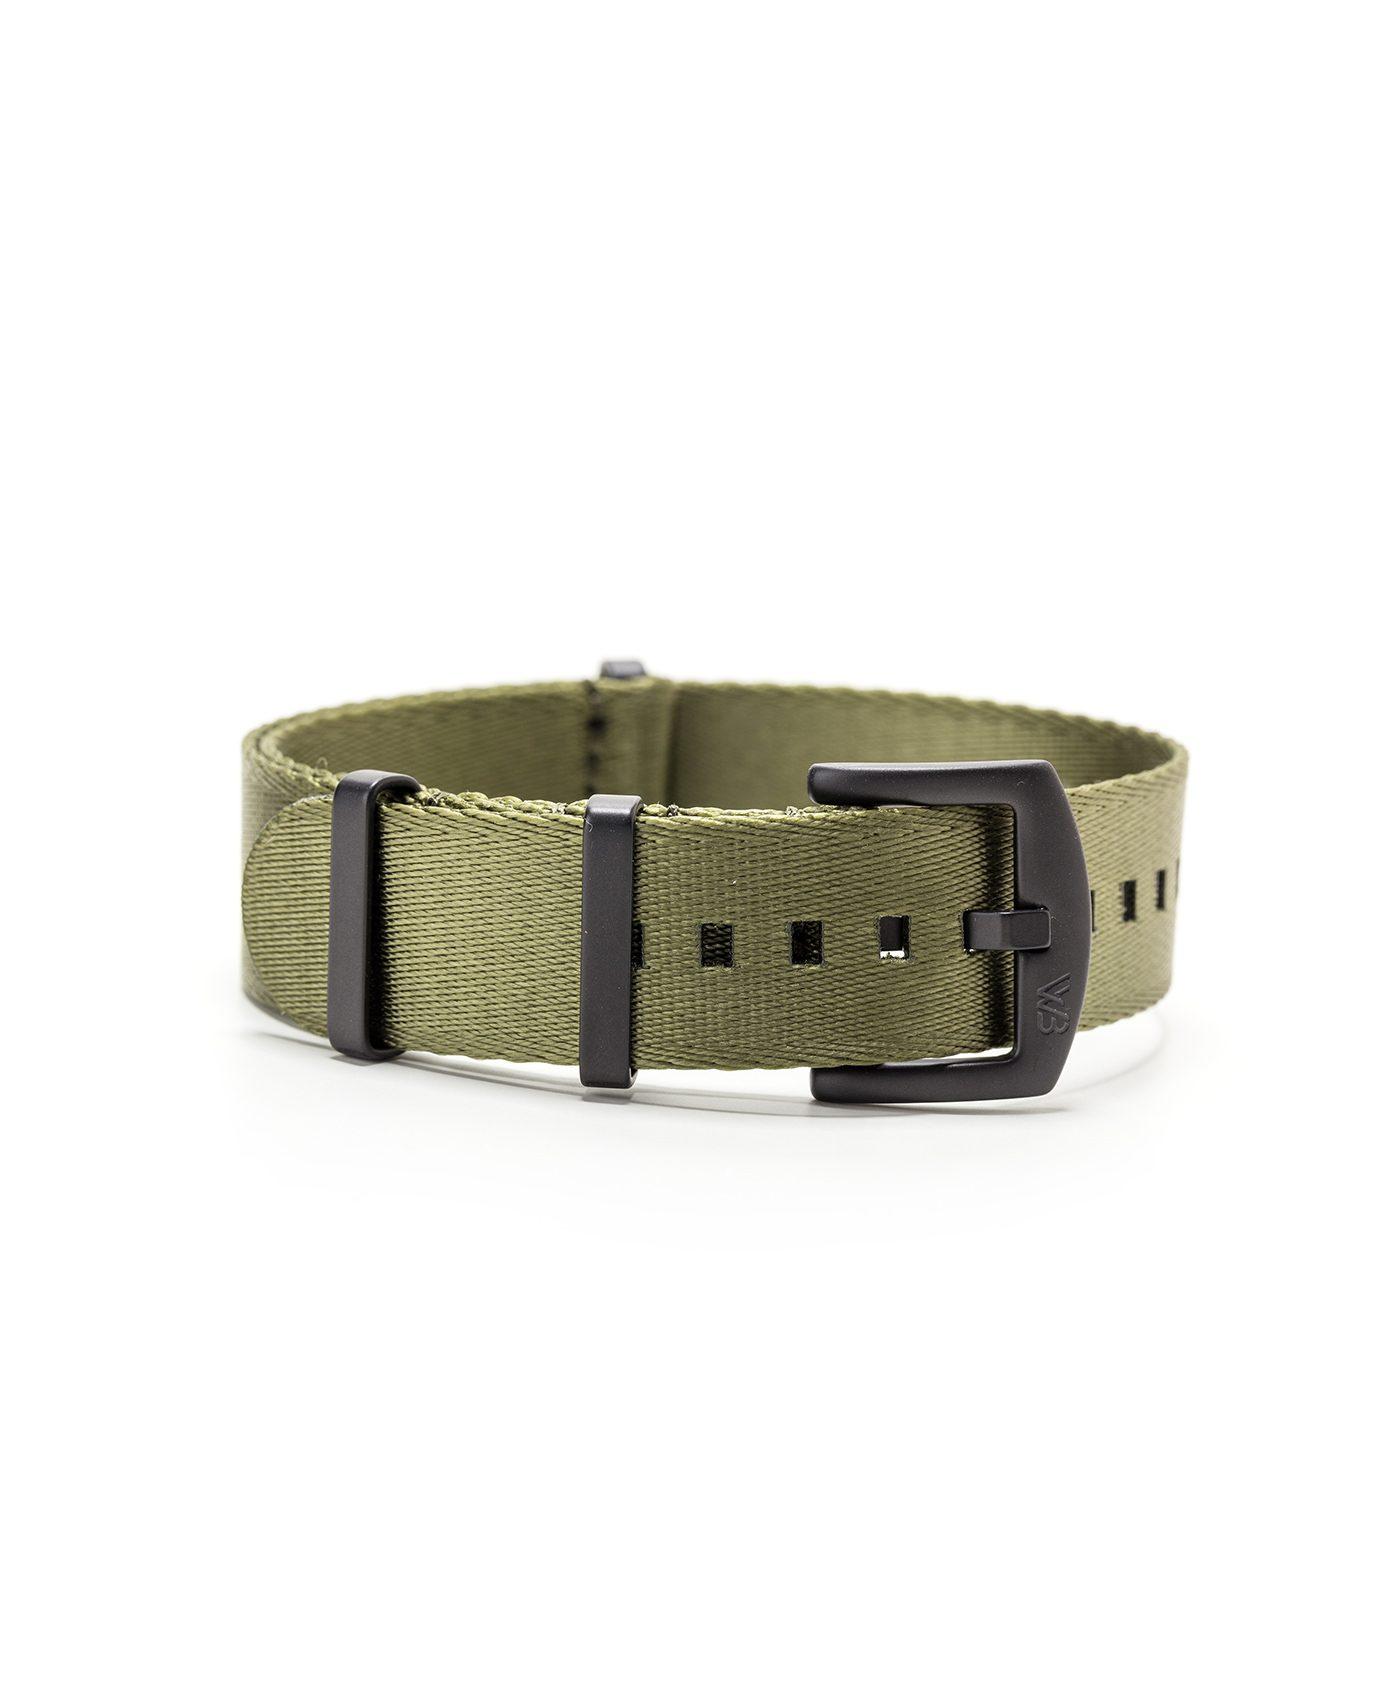 Watchbandit WB original Wristporn Nato strap in olive green and black buckles